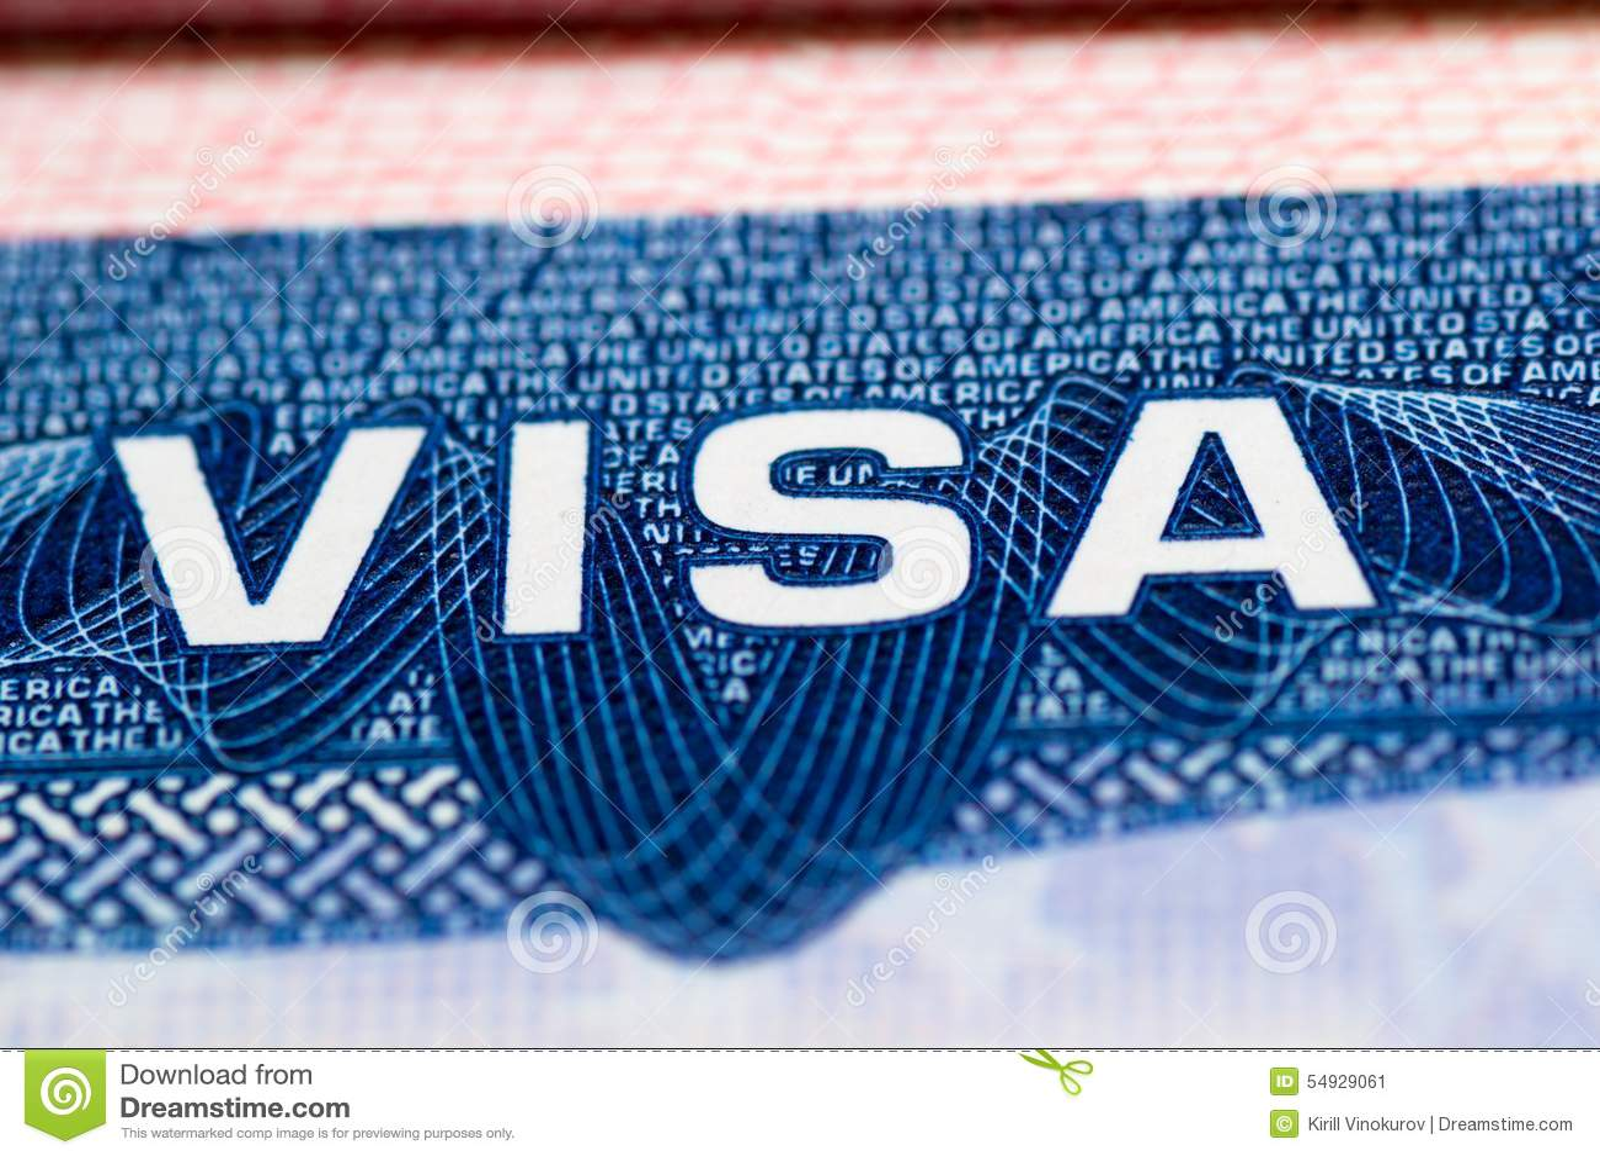 Visa Passport Stock Image Image Of Symbol White Identity 54929061